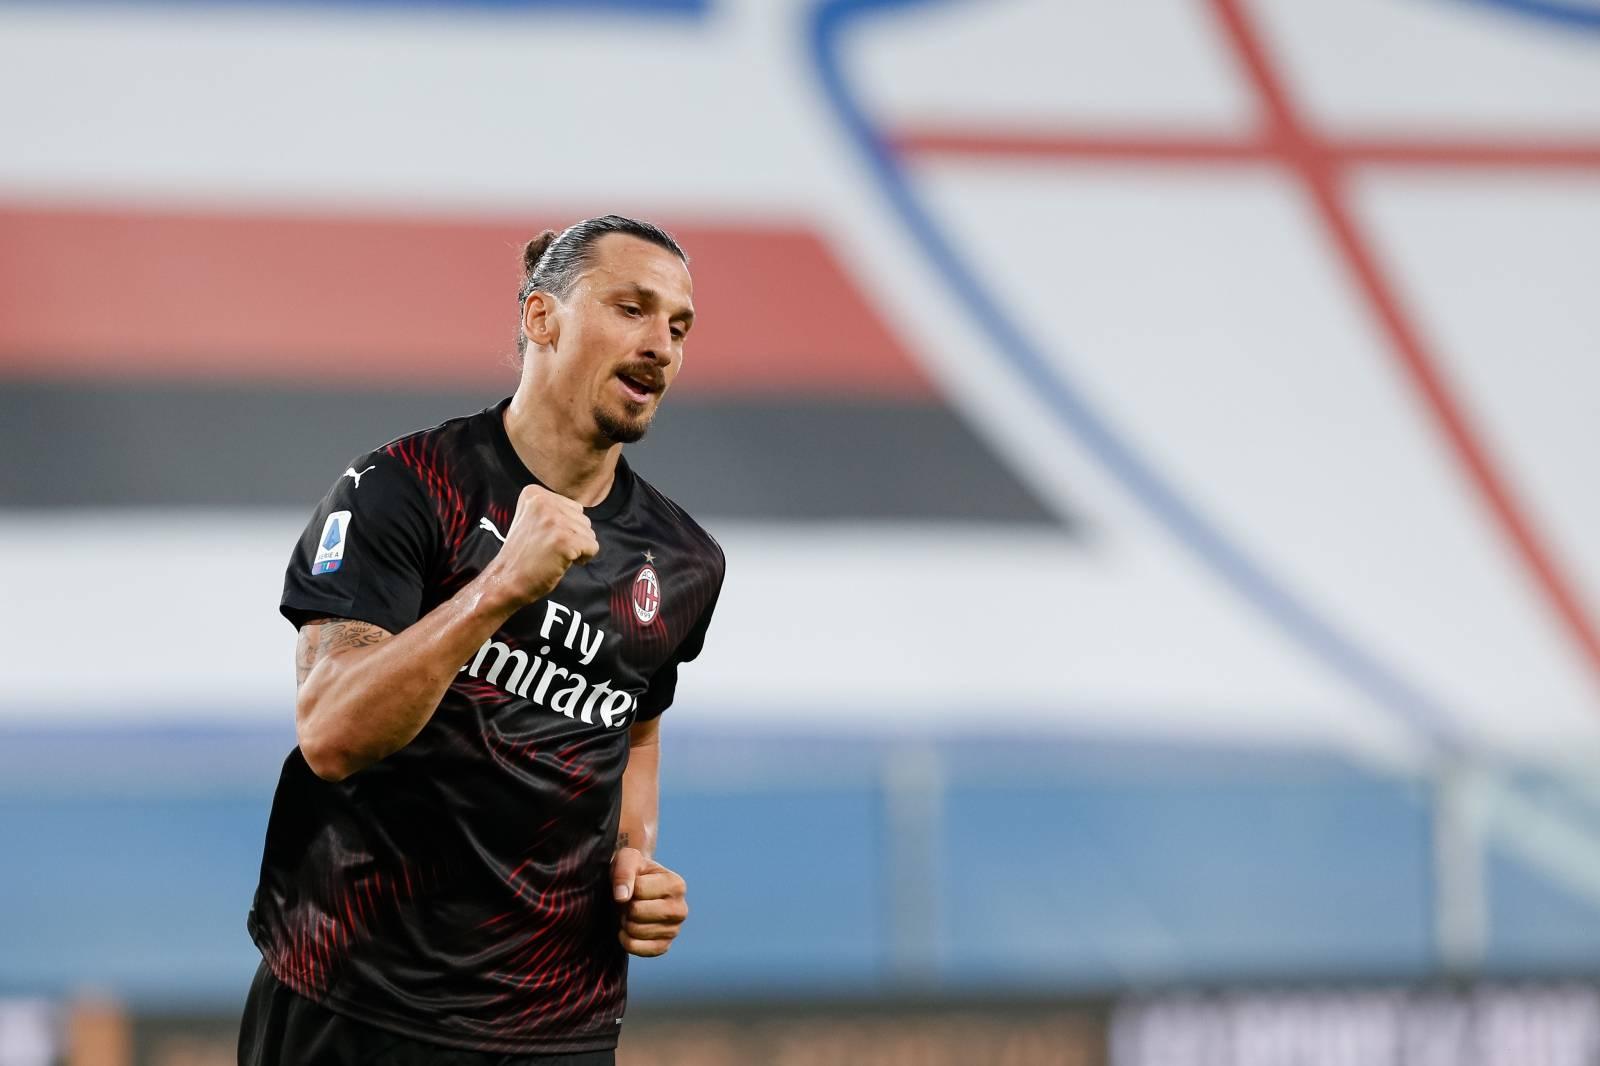 italian Serie A soccer match - Sampdoria vs Milan